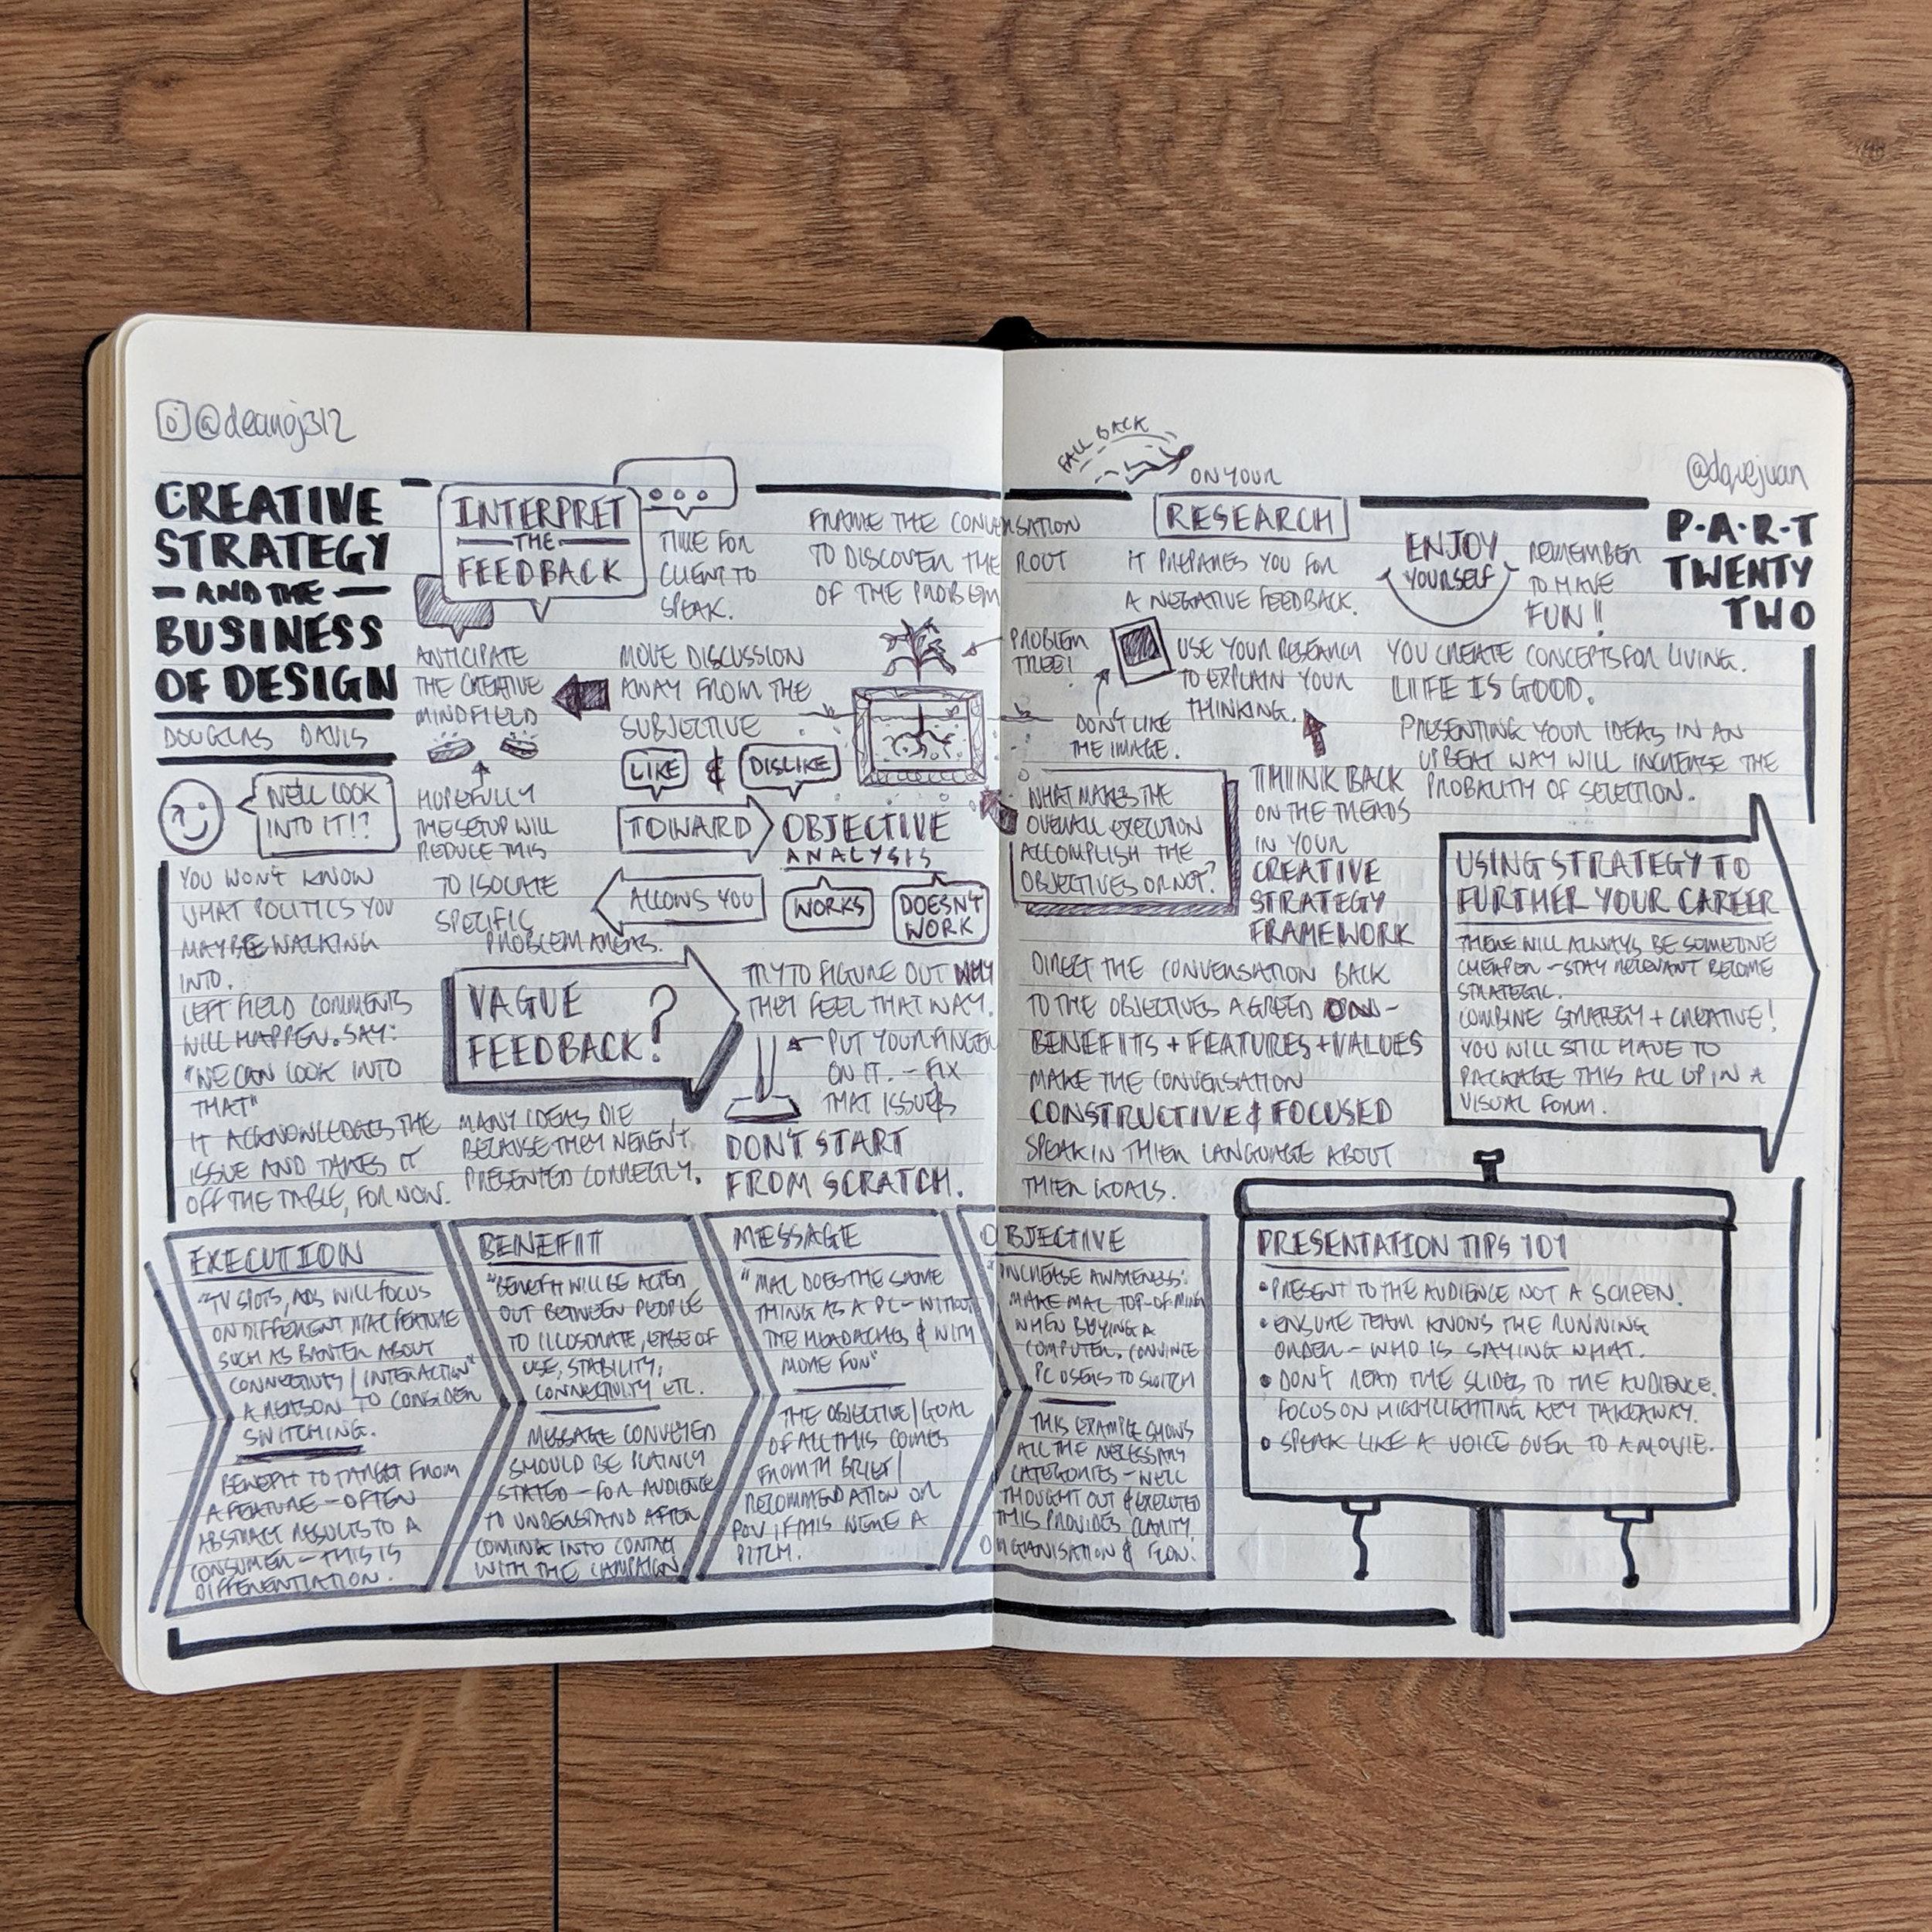 CreativeStrategyAndTheBusinessOfDesign_Part22.1.jpg